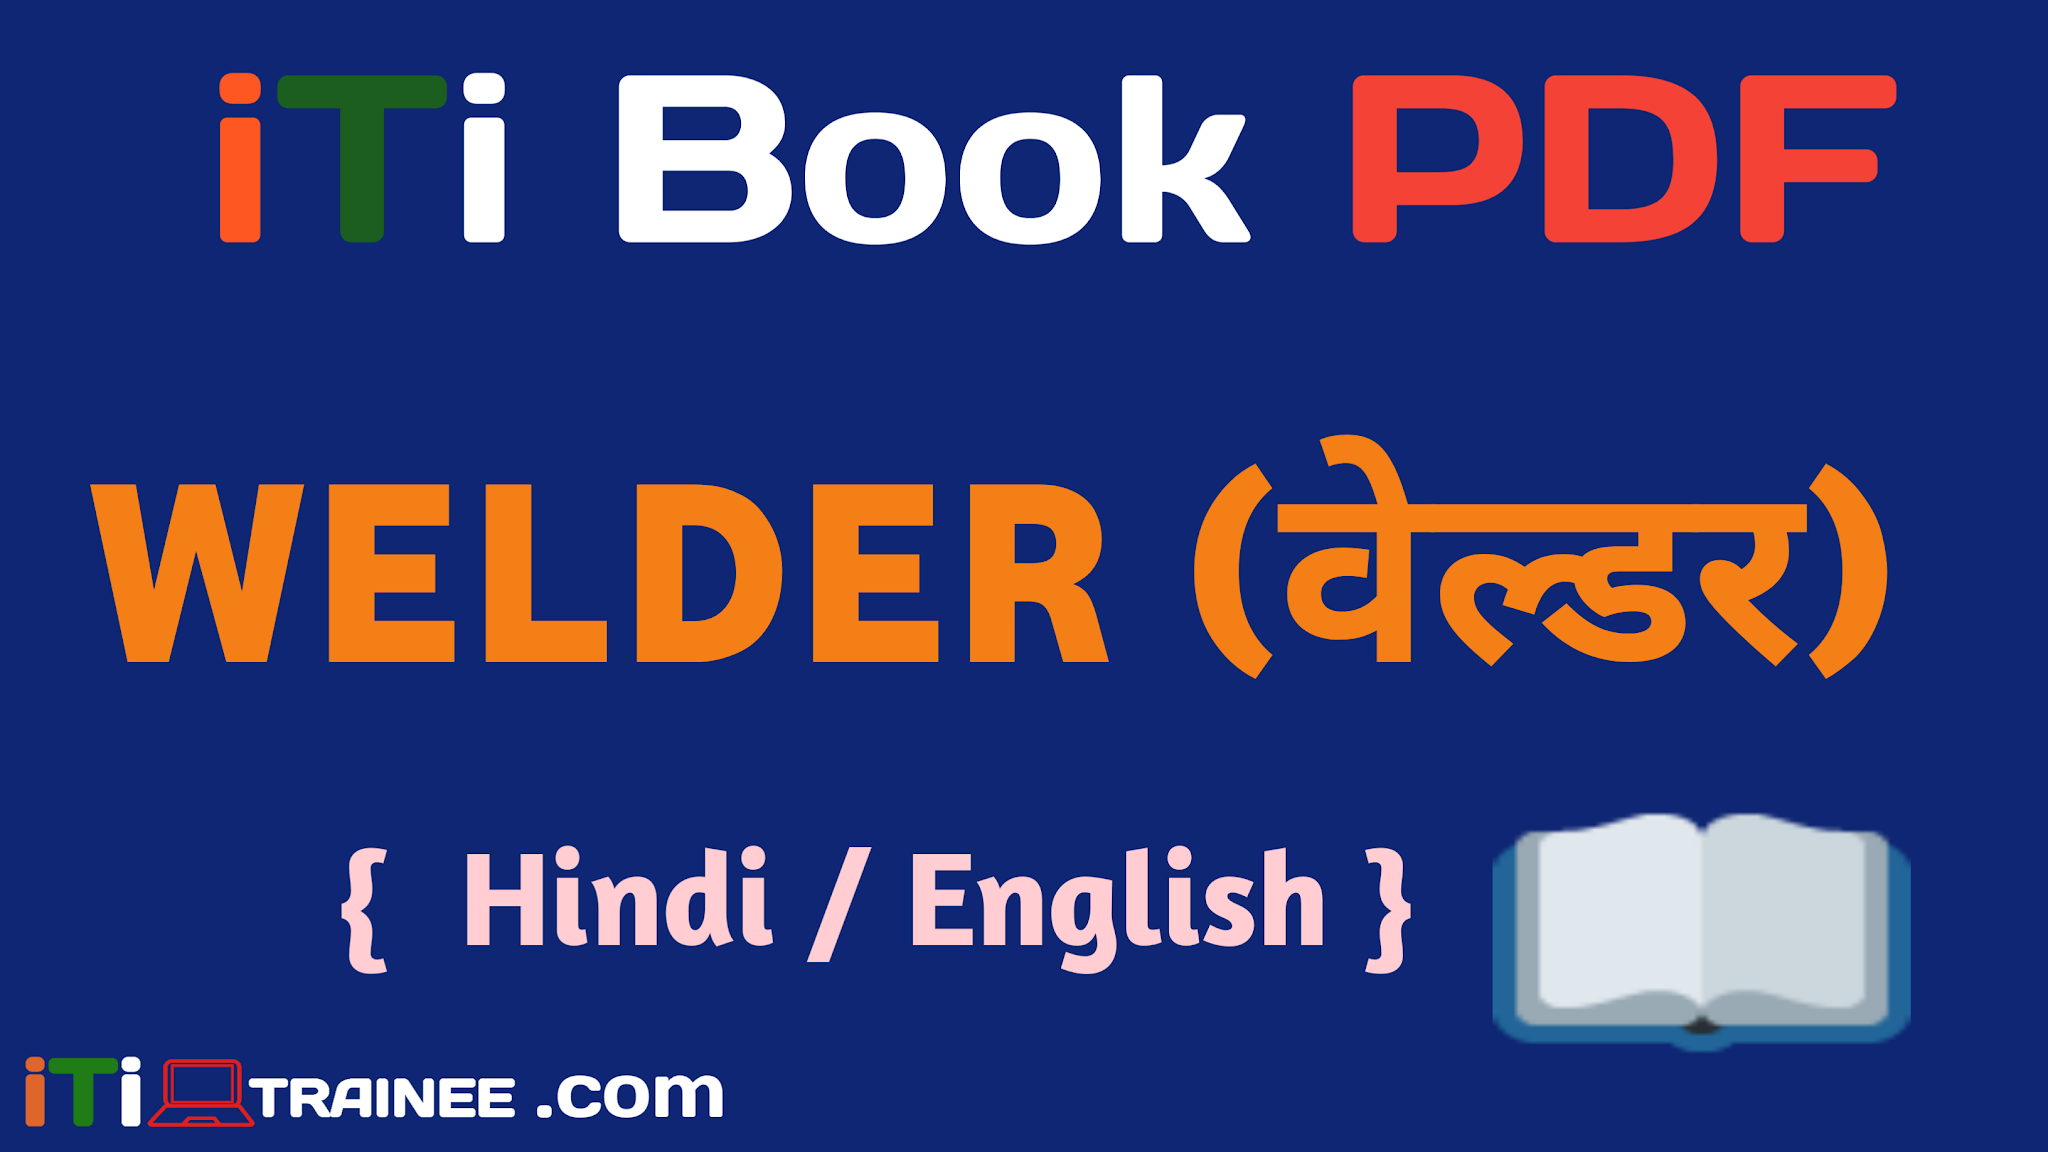 ITI WELDER BOOK PDF Download